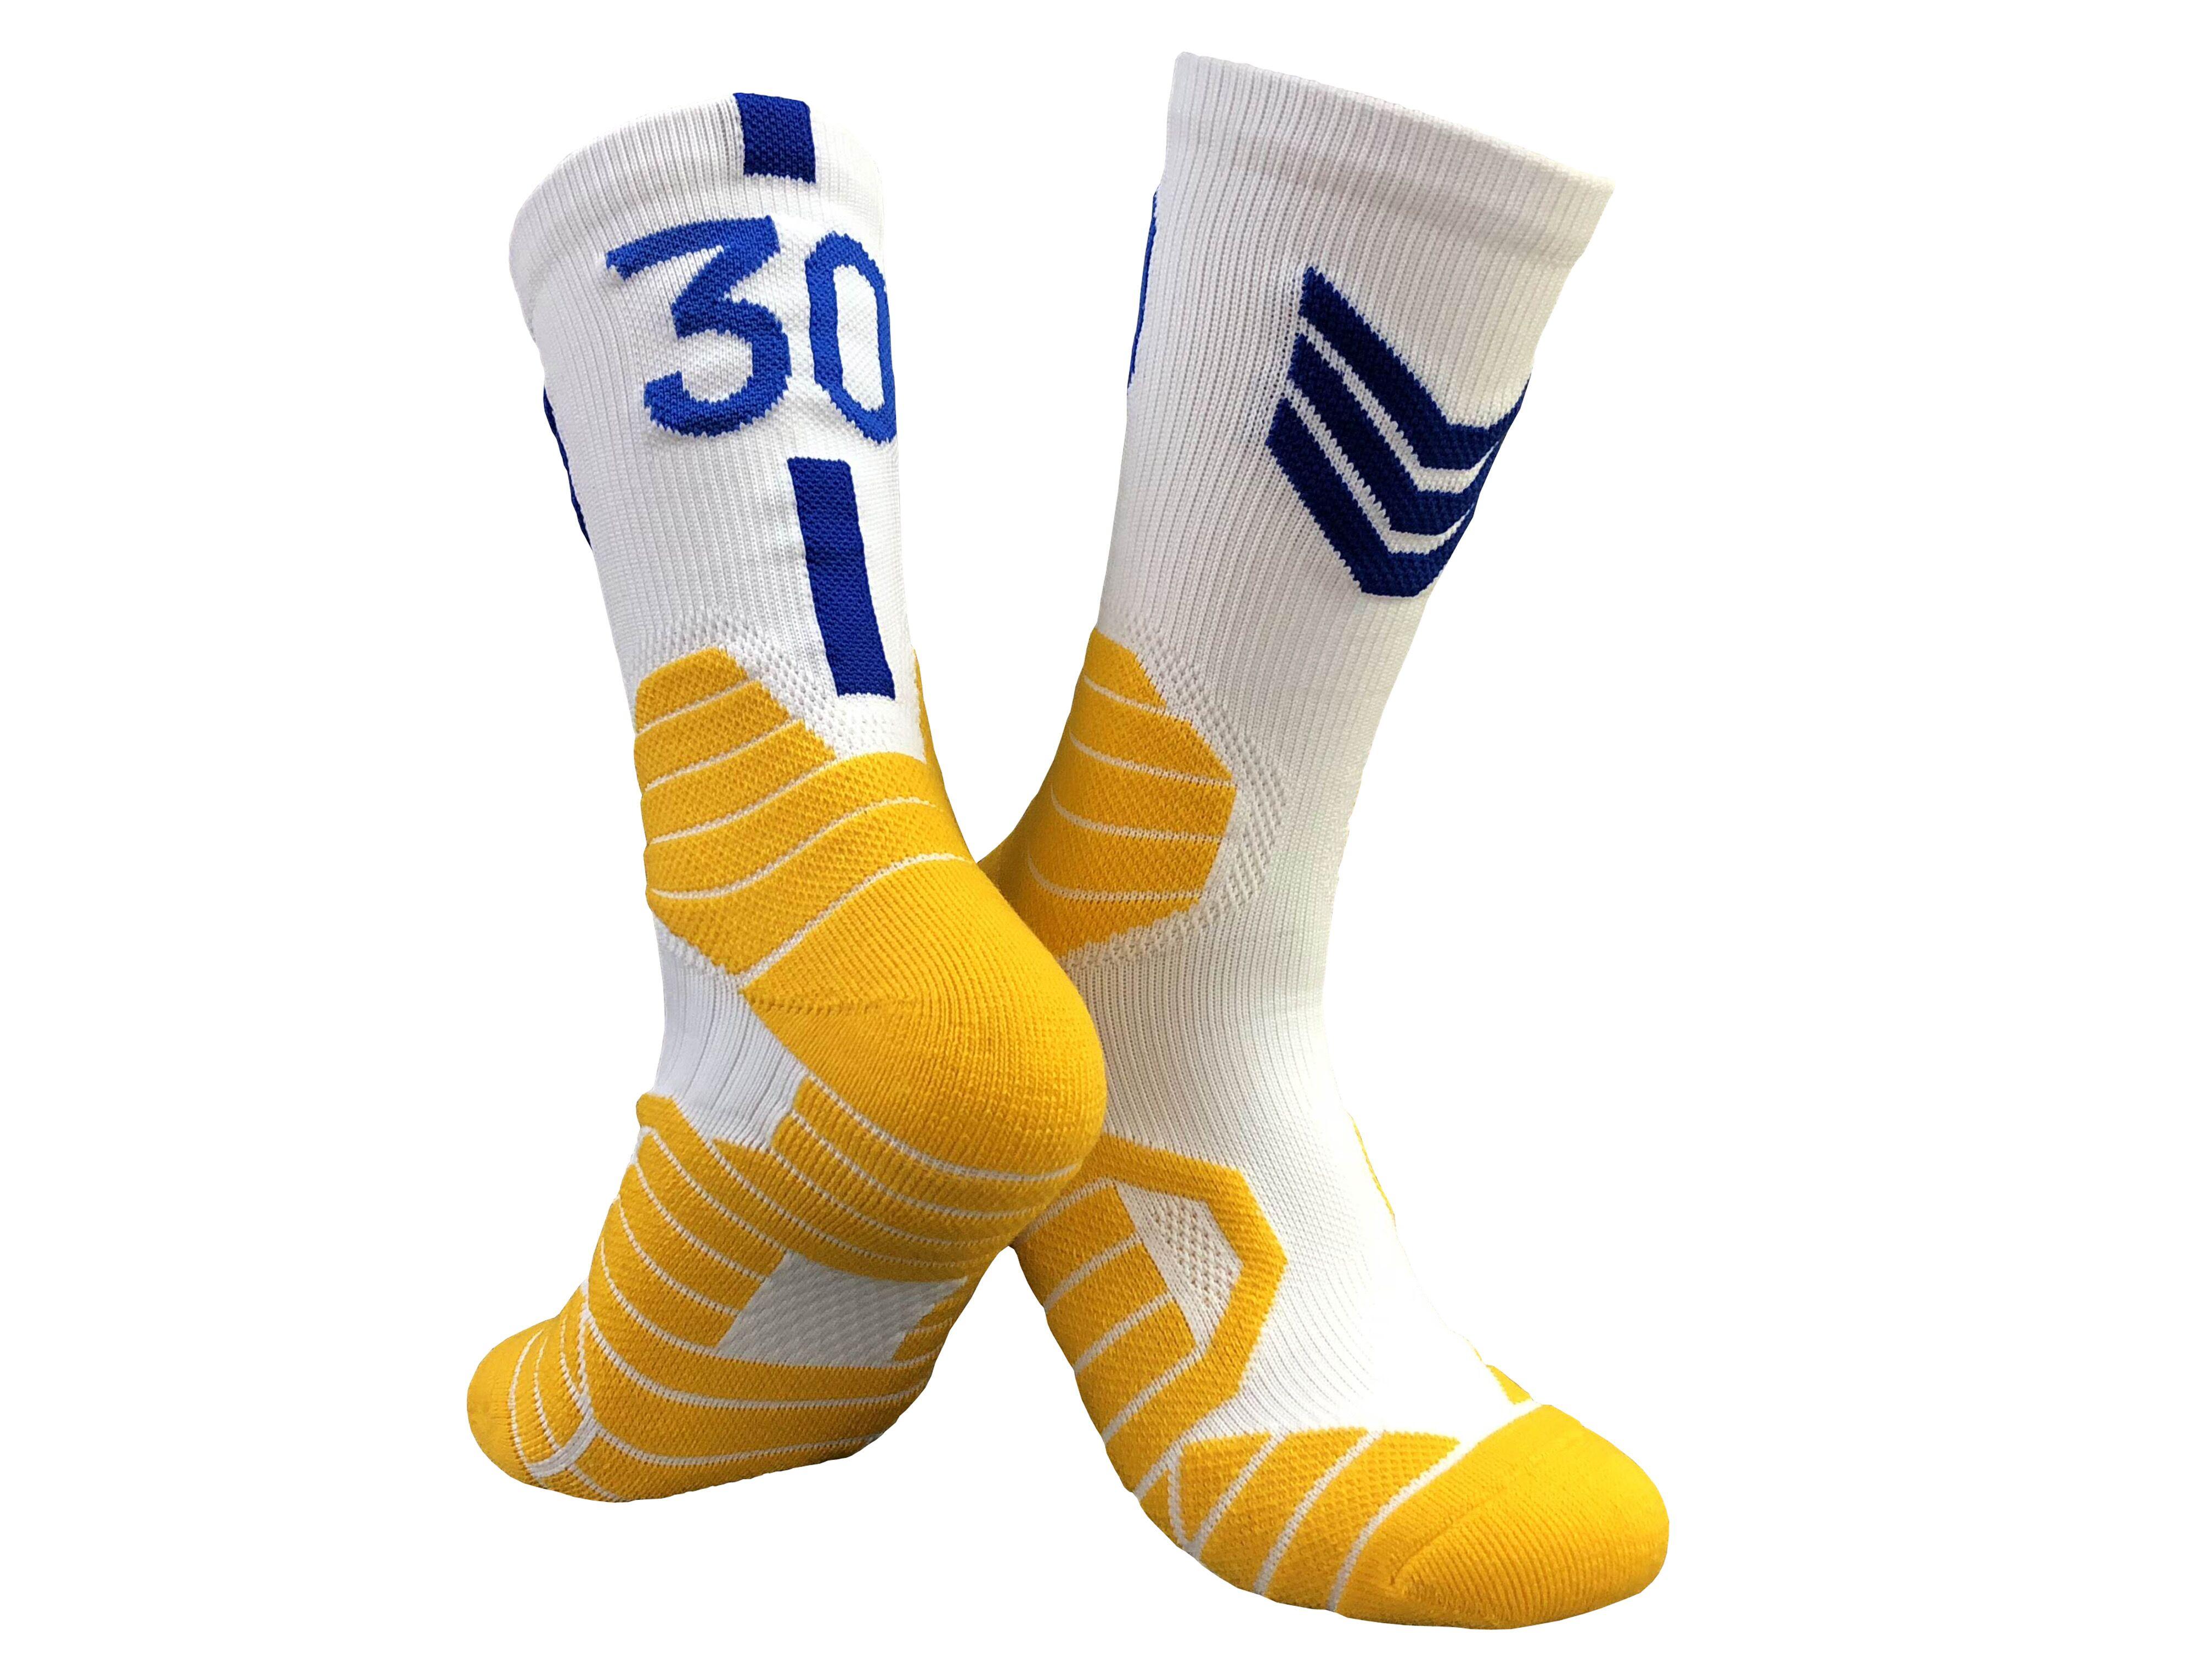 1 pair 30 white